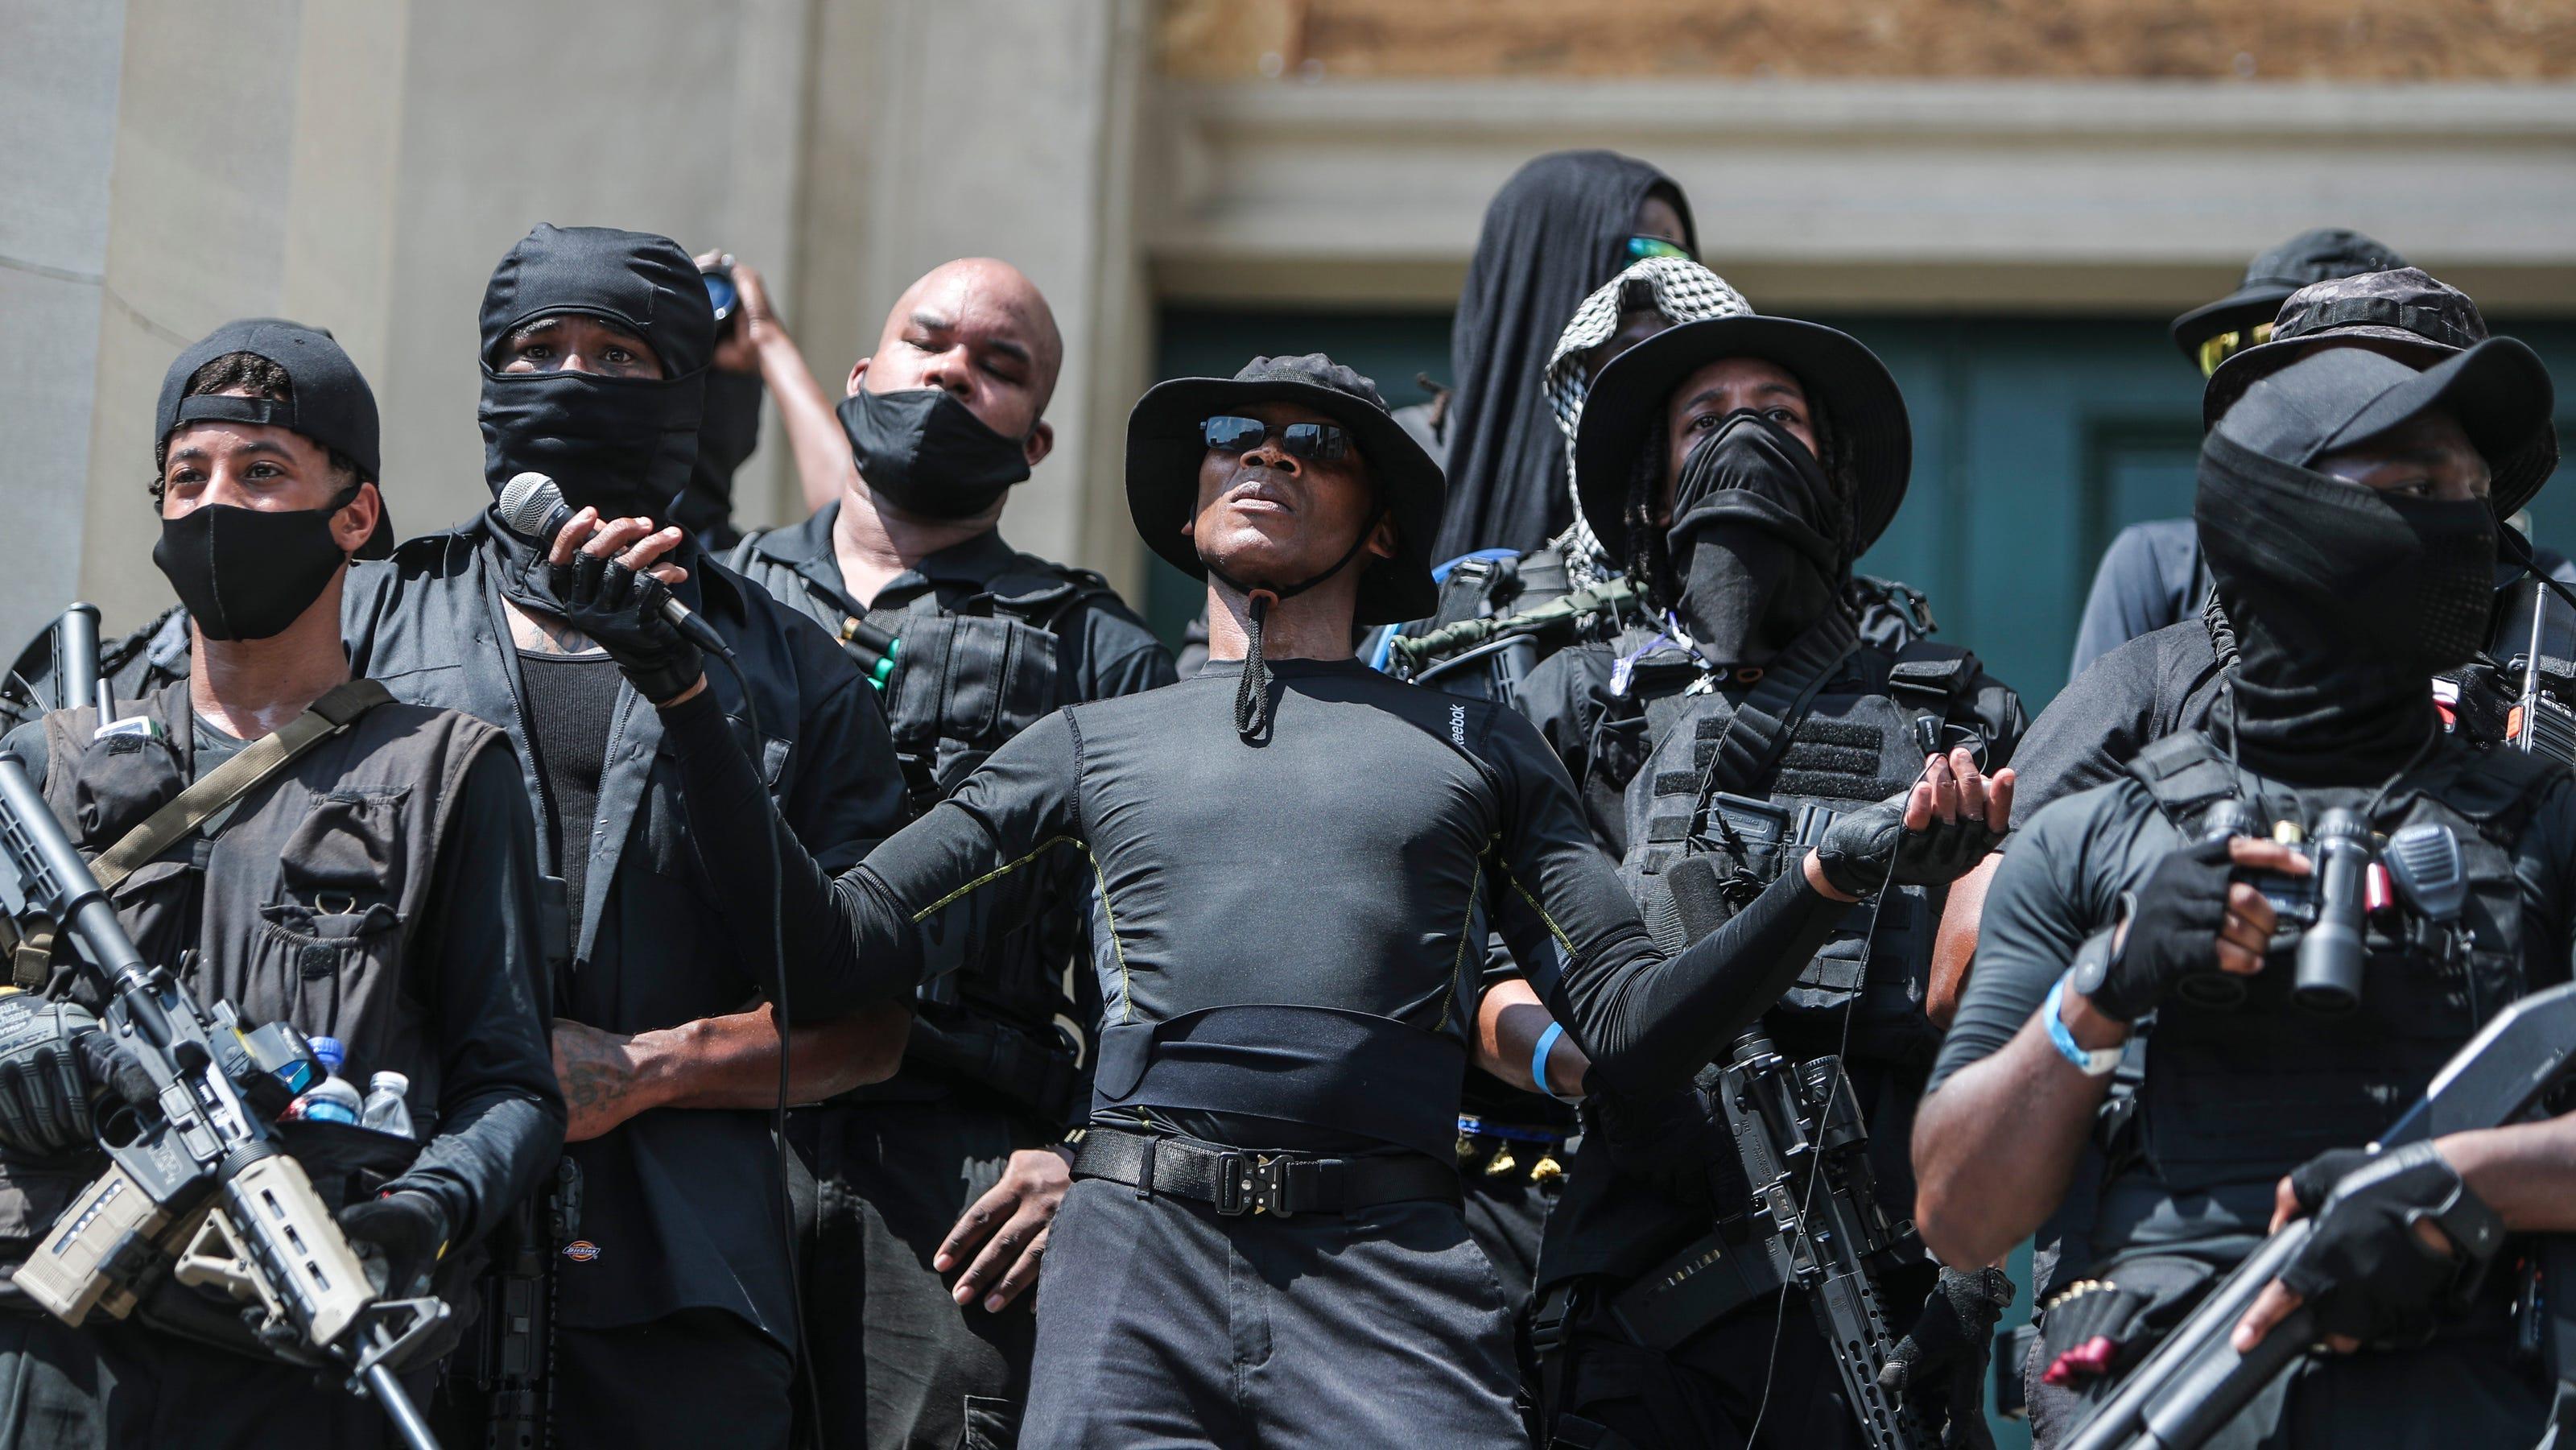 nfac black militia